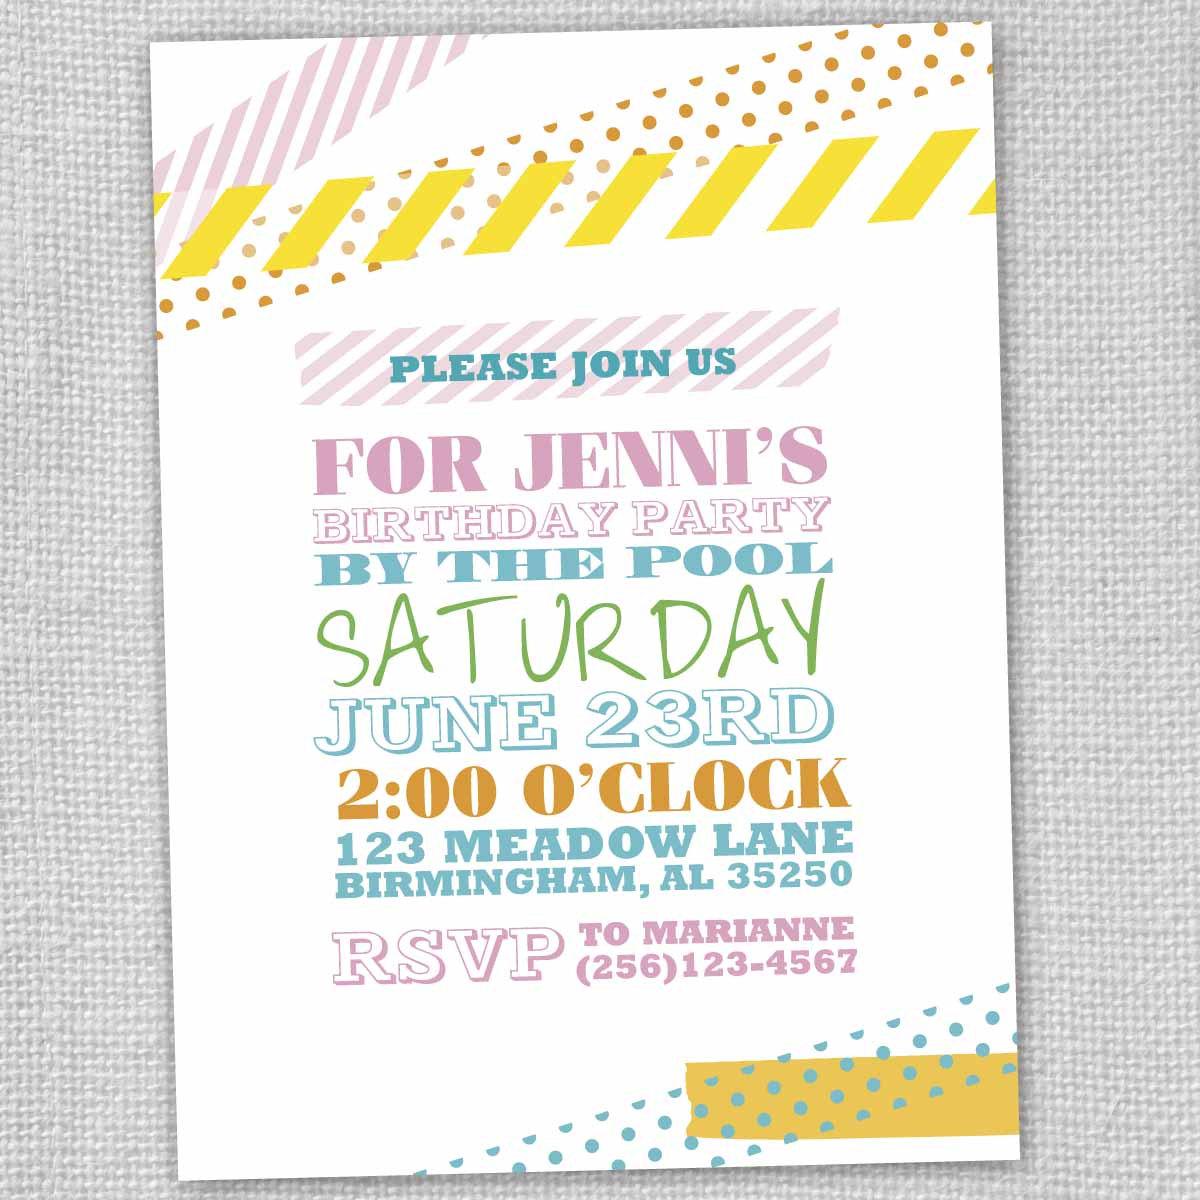 via etsy.com/listing/98853474/washi-tape-birthday-pool-party-invite